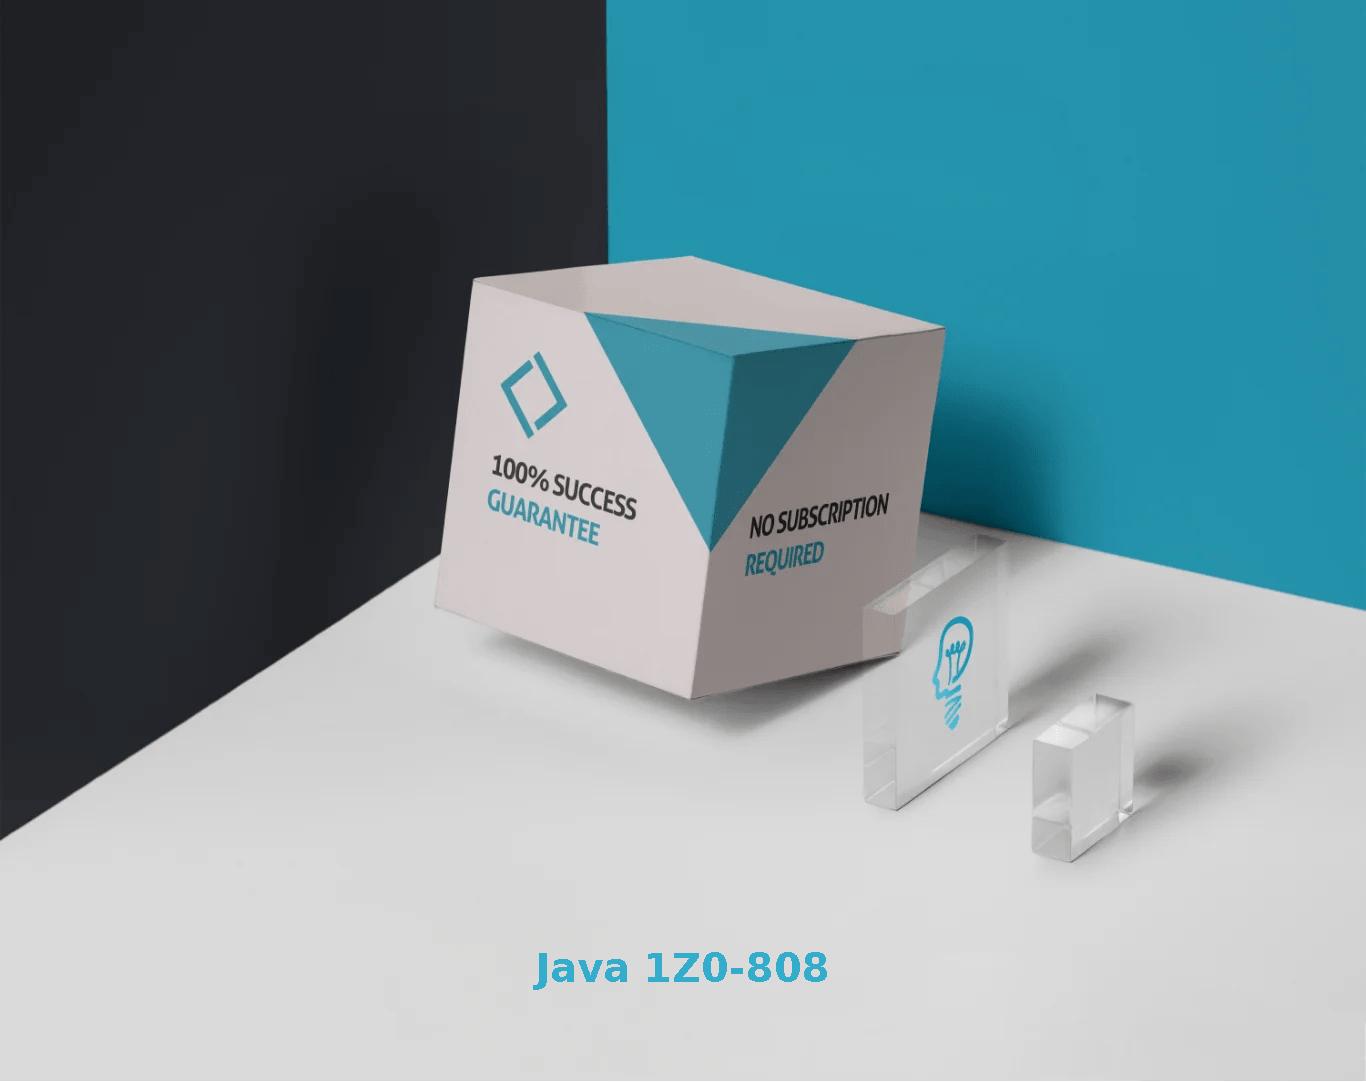 Java 1Z0-808 Exams